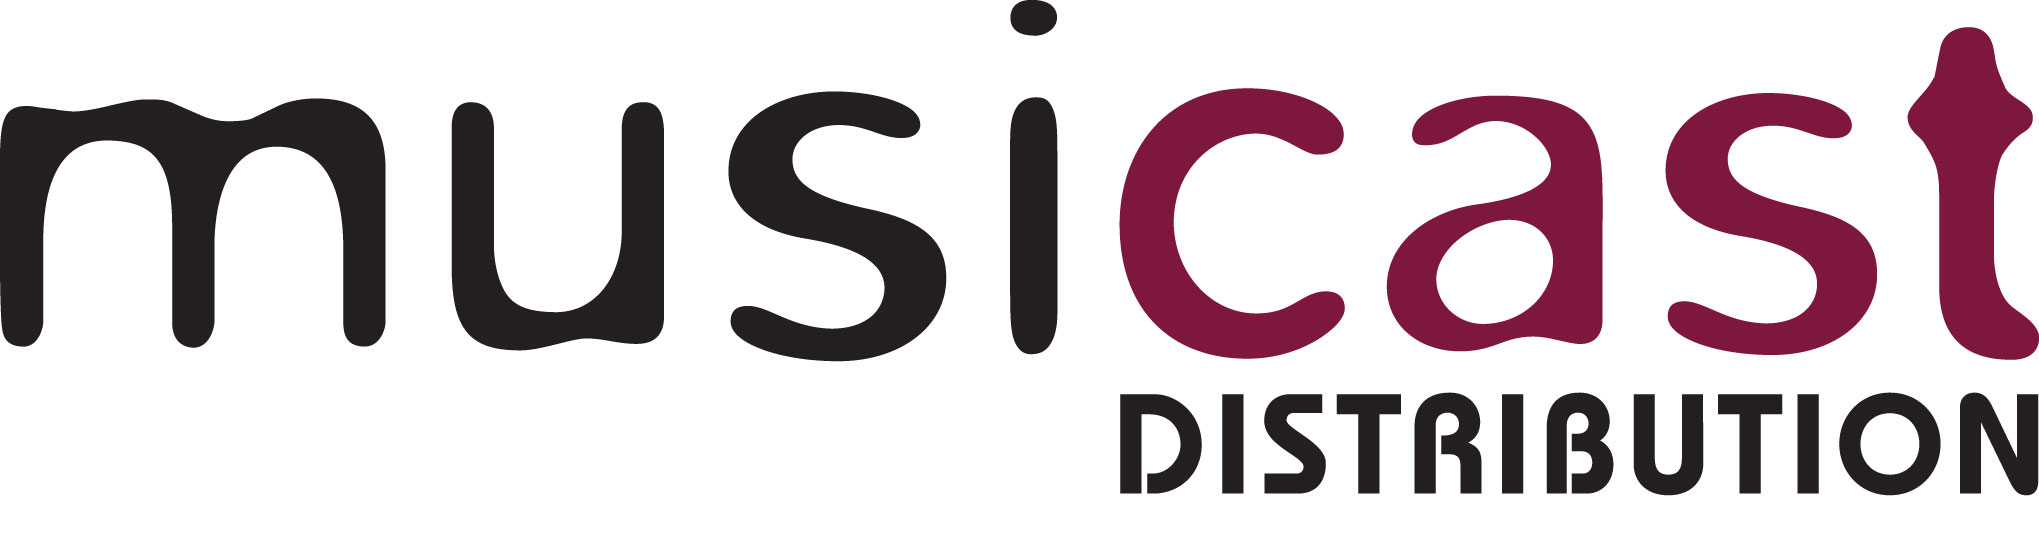 Musicast logo